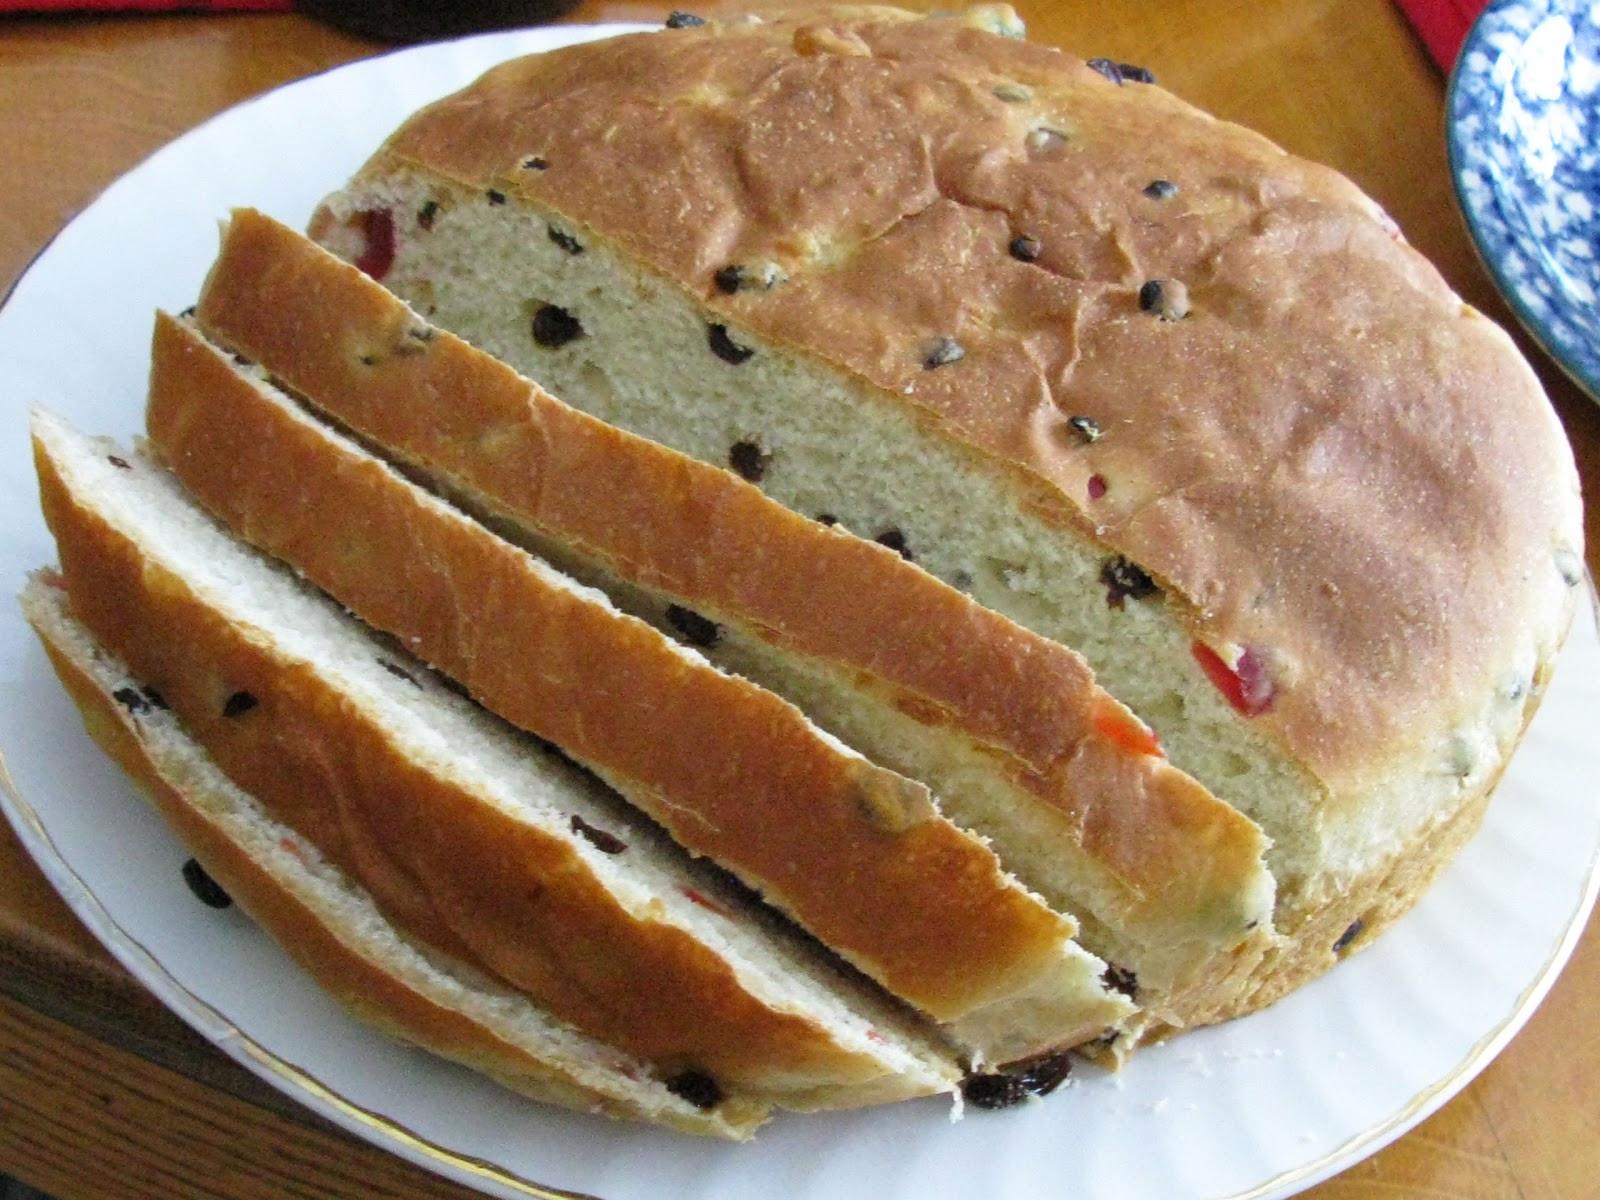 Julekake Norwegian Christmas Bread Recipe  Food for A Hungry Soul Julekake Norwegian Christmas Bread